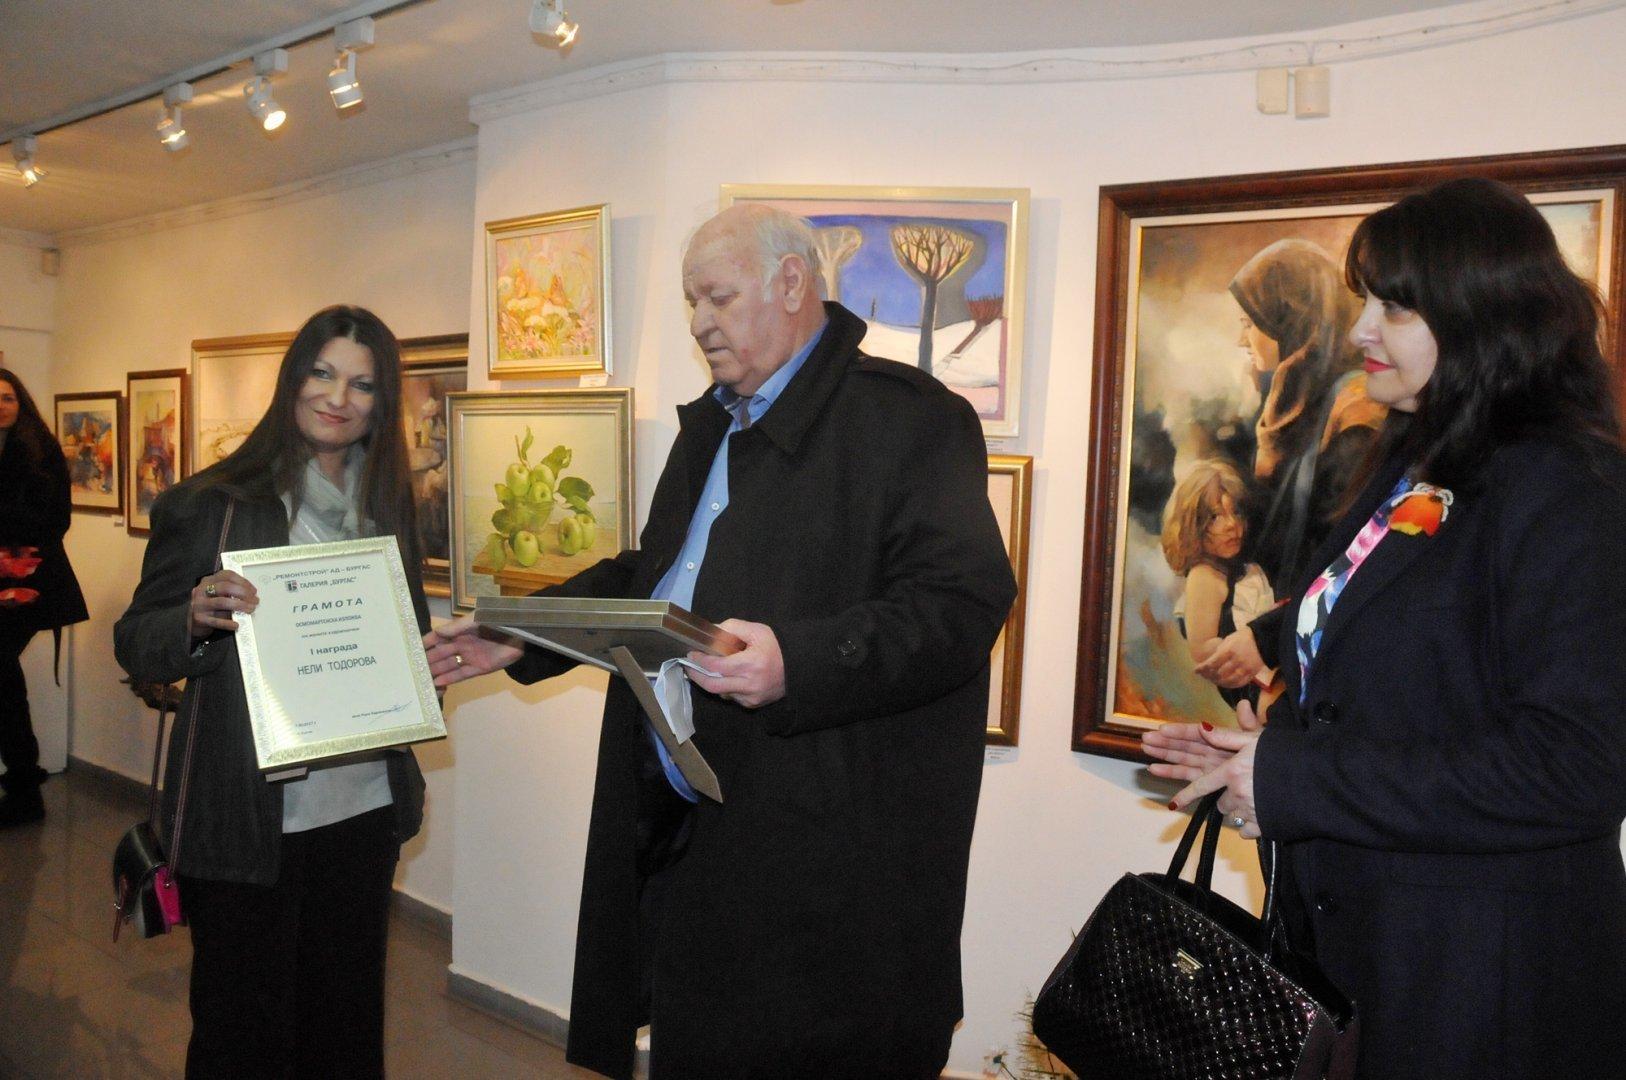 Руси Куртлаков е и собственик на първата частна галерия Бургас. Снимка Архив Черноморие-бг